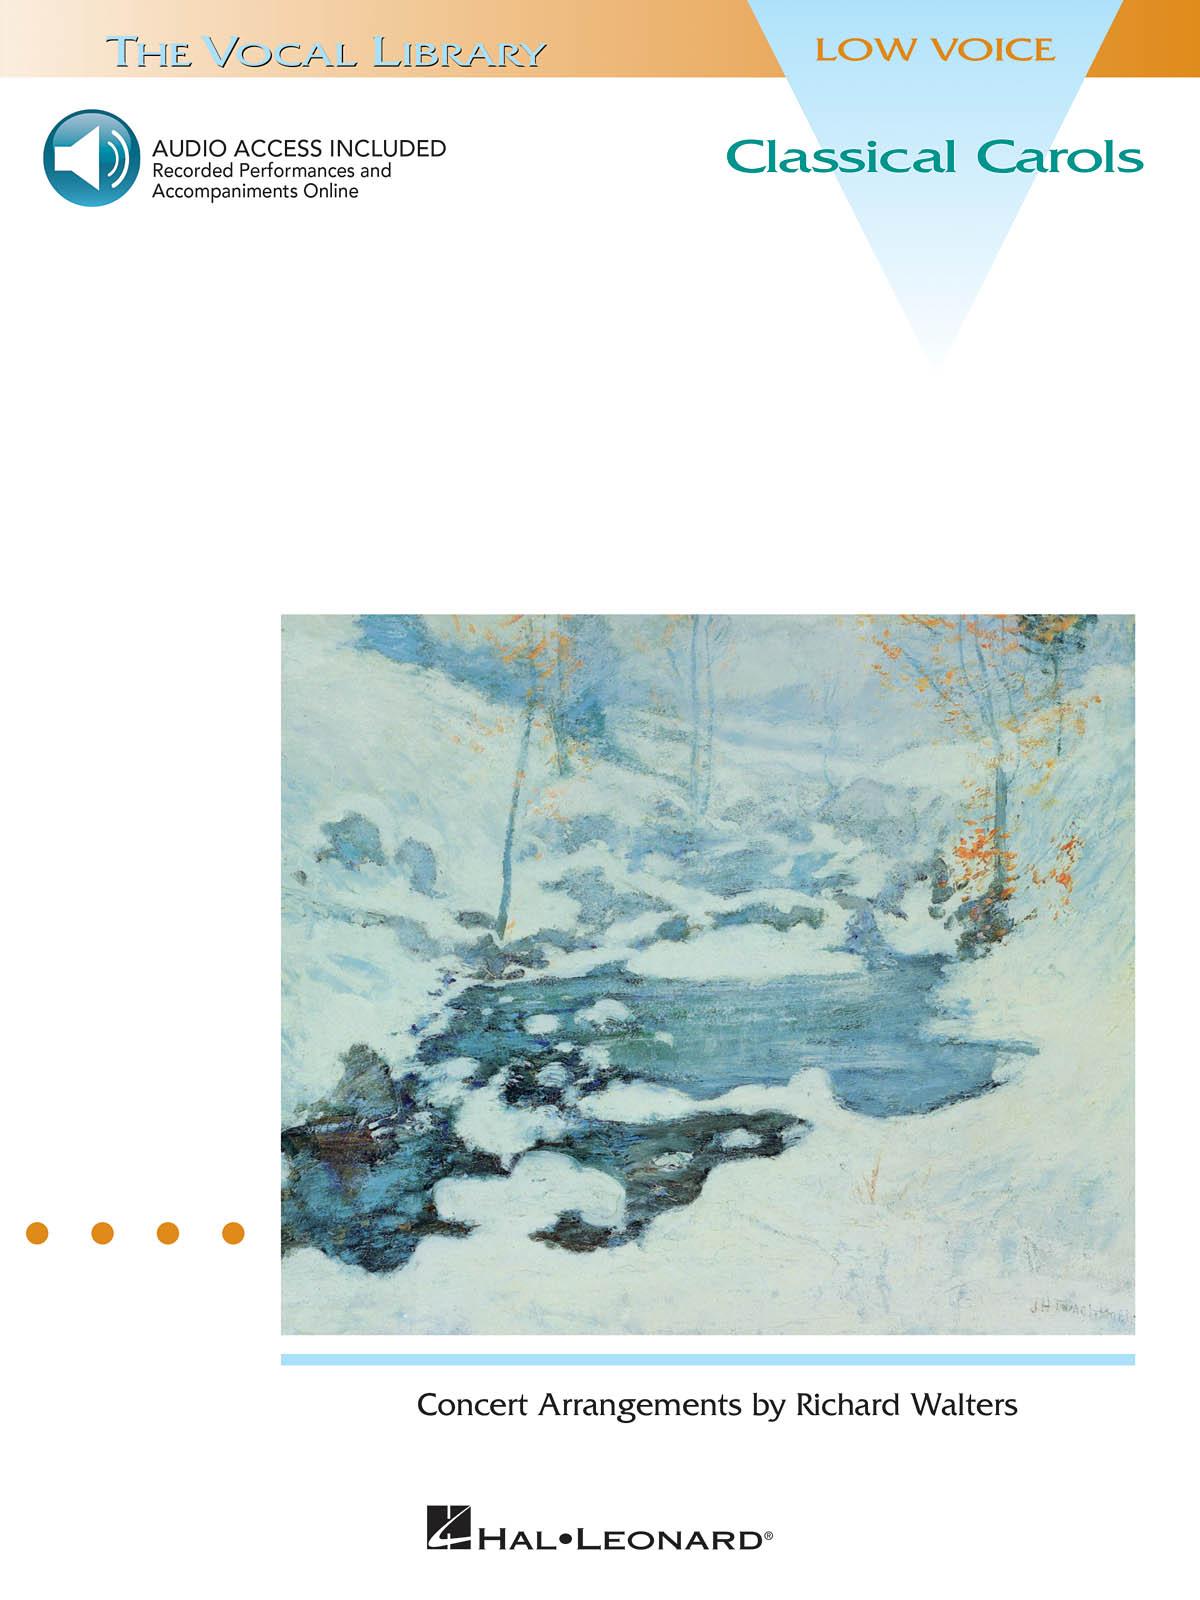 Classical Carols (Low Voice): Vocal and Piano: Vocal Album